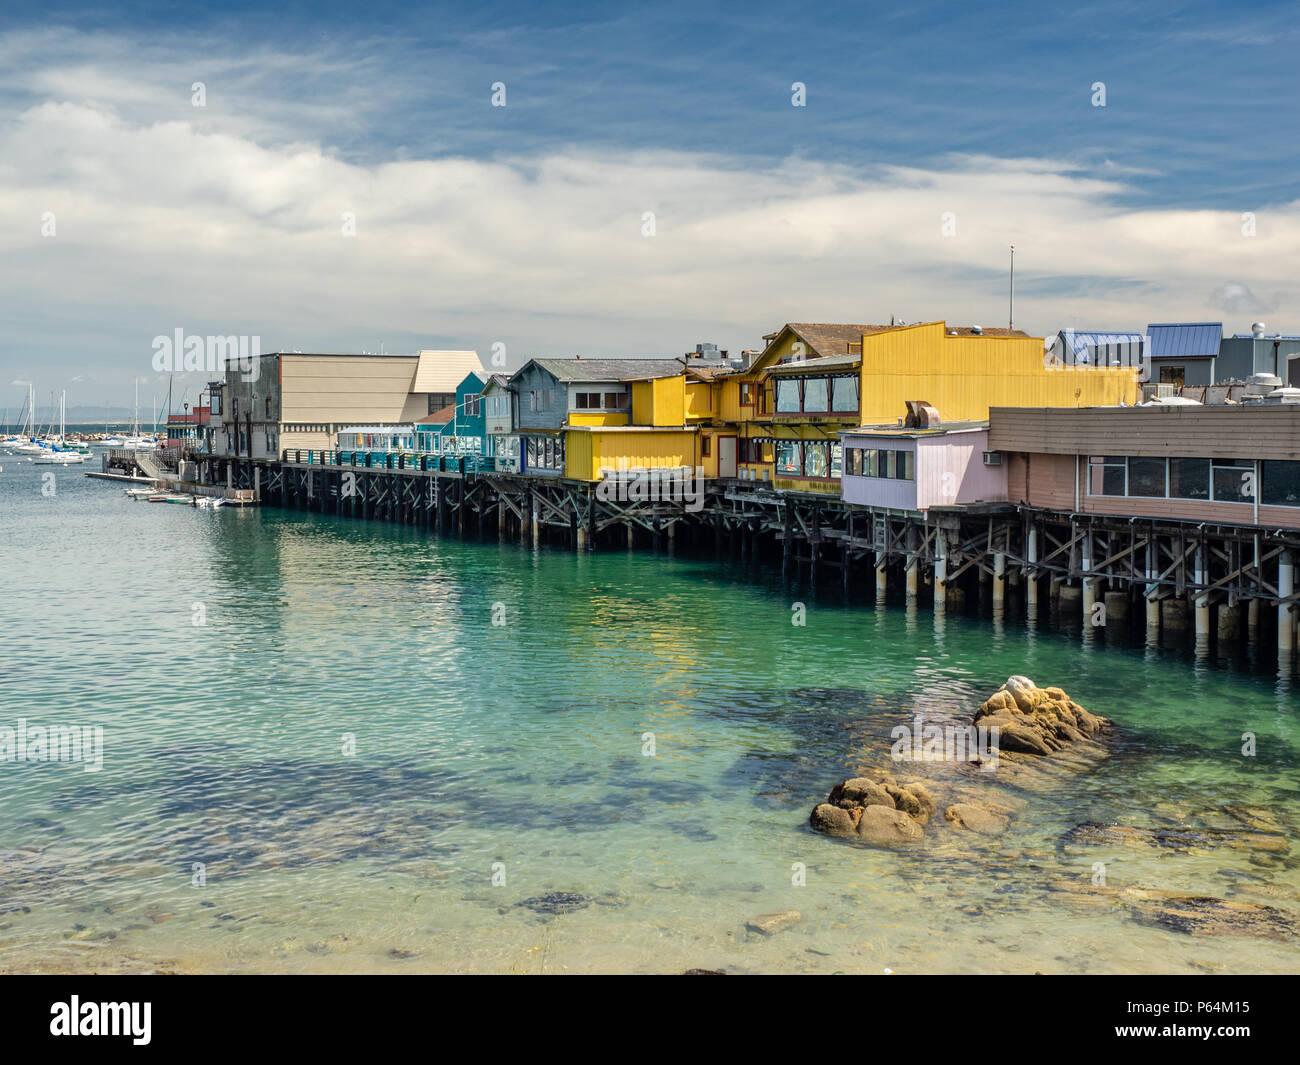 Old Fisherman's Wharf on the California Coastal Recreational Trail, Monterey, California, USA. Stock Photo